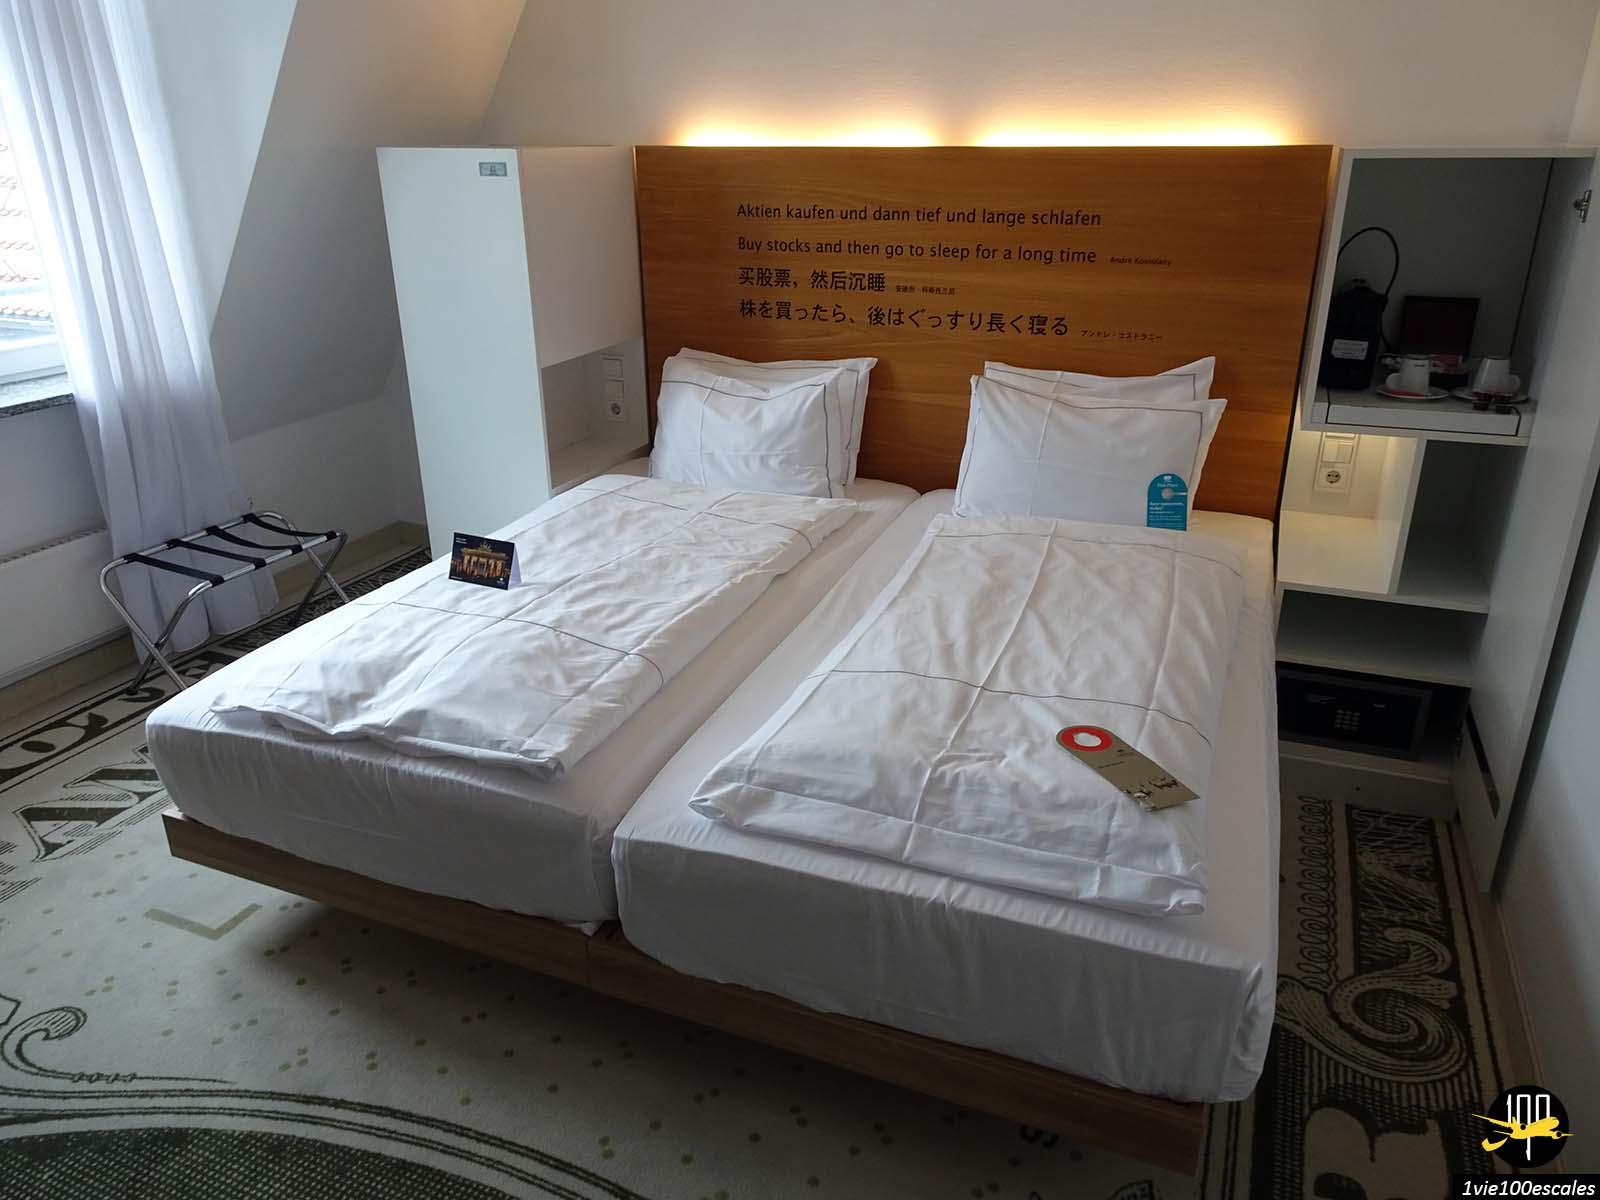 La chambre de l'hotel Park Plaza Wallstreet Berlin Mitte